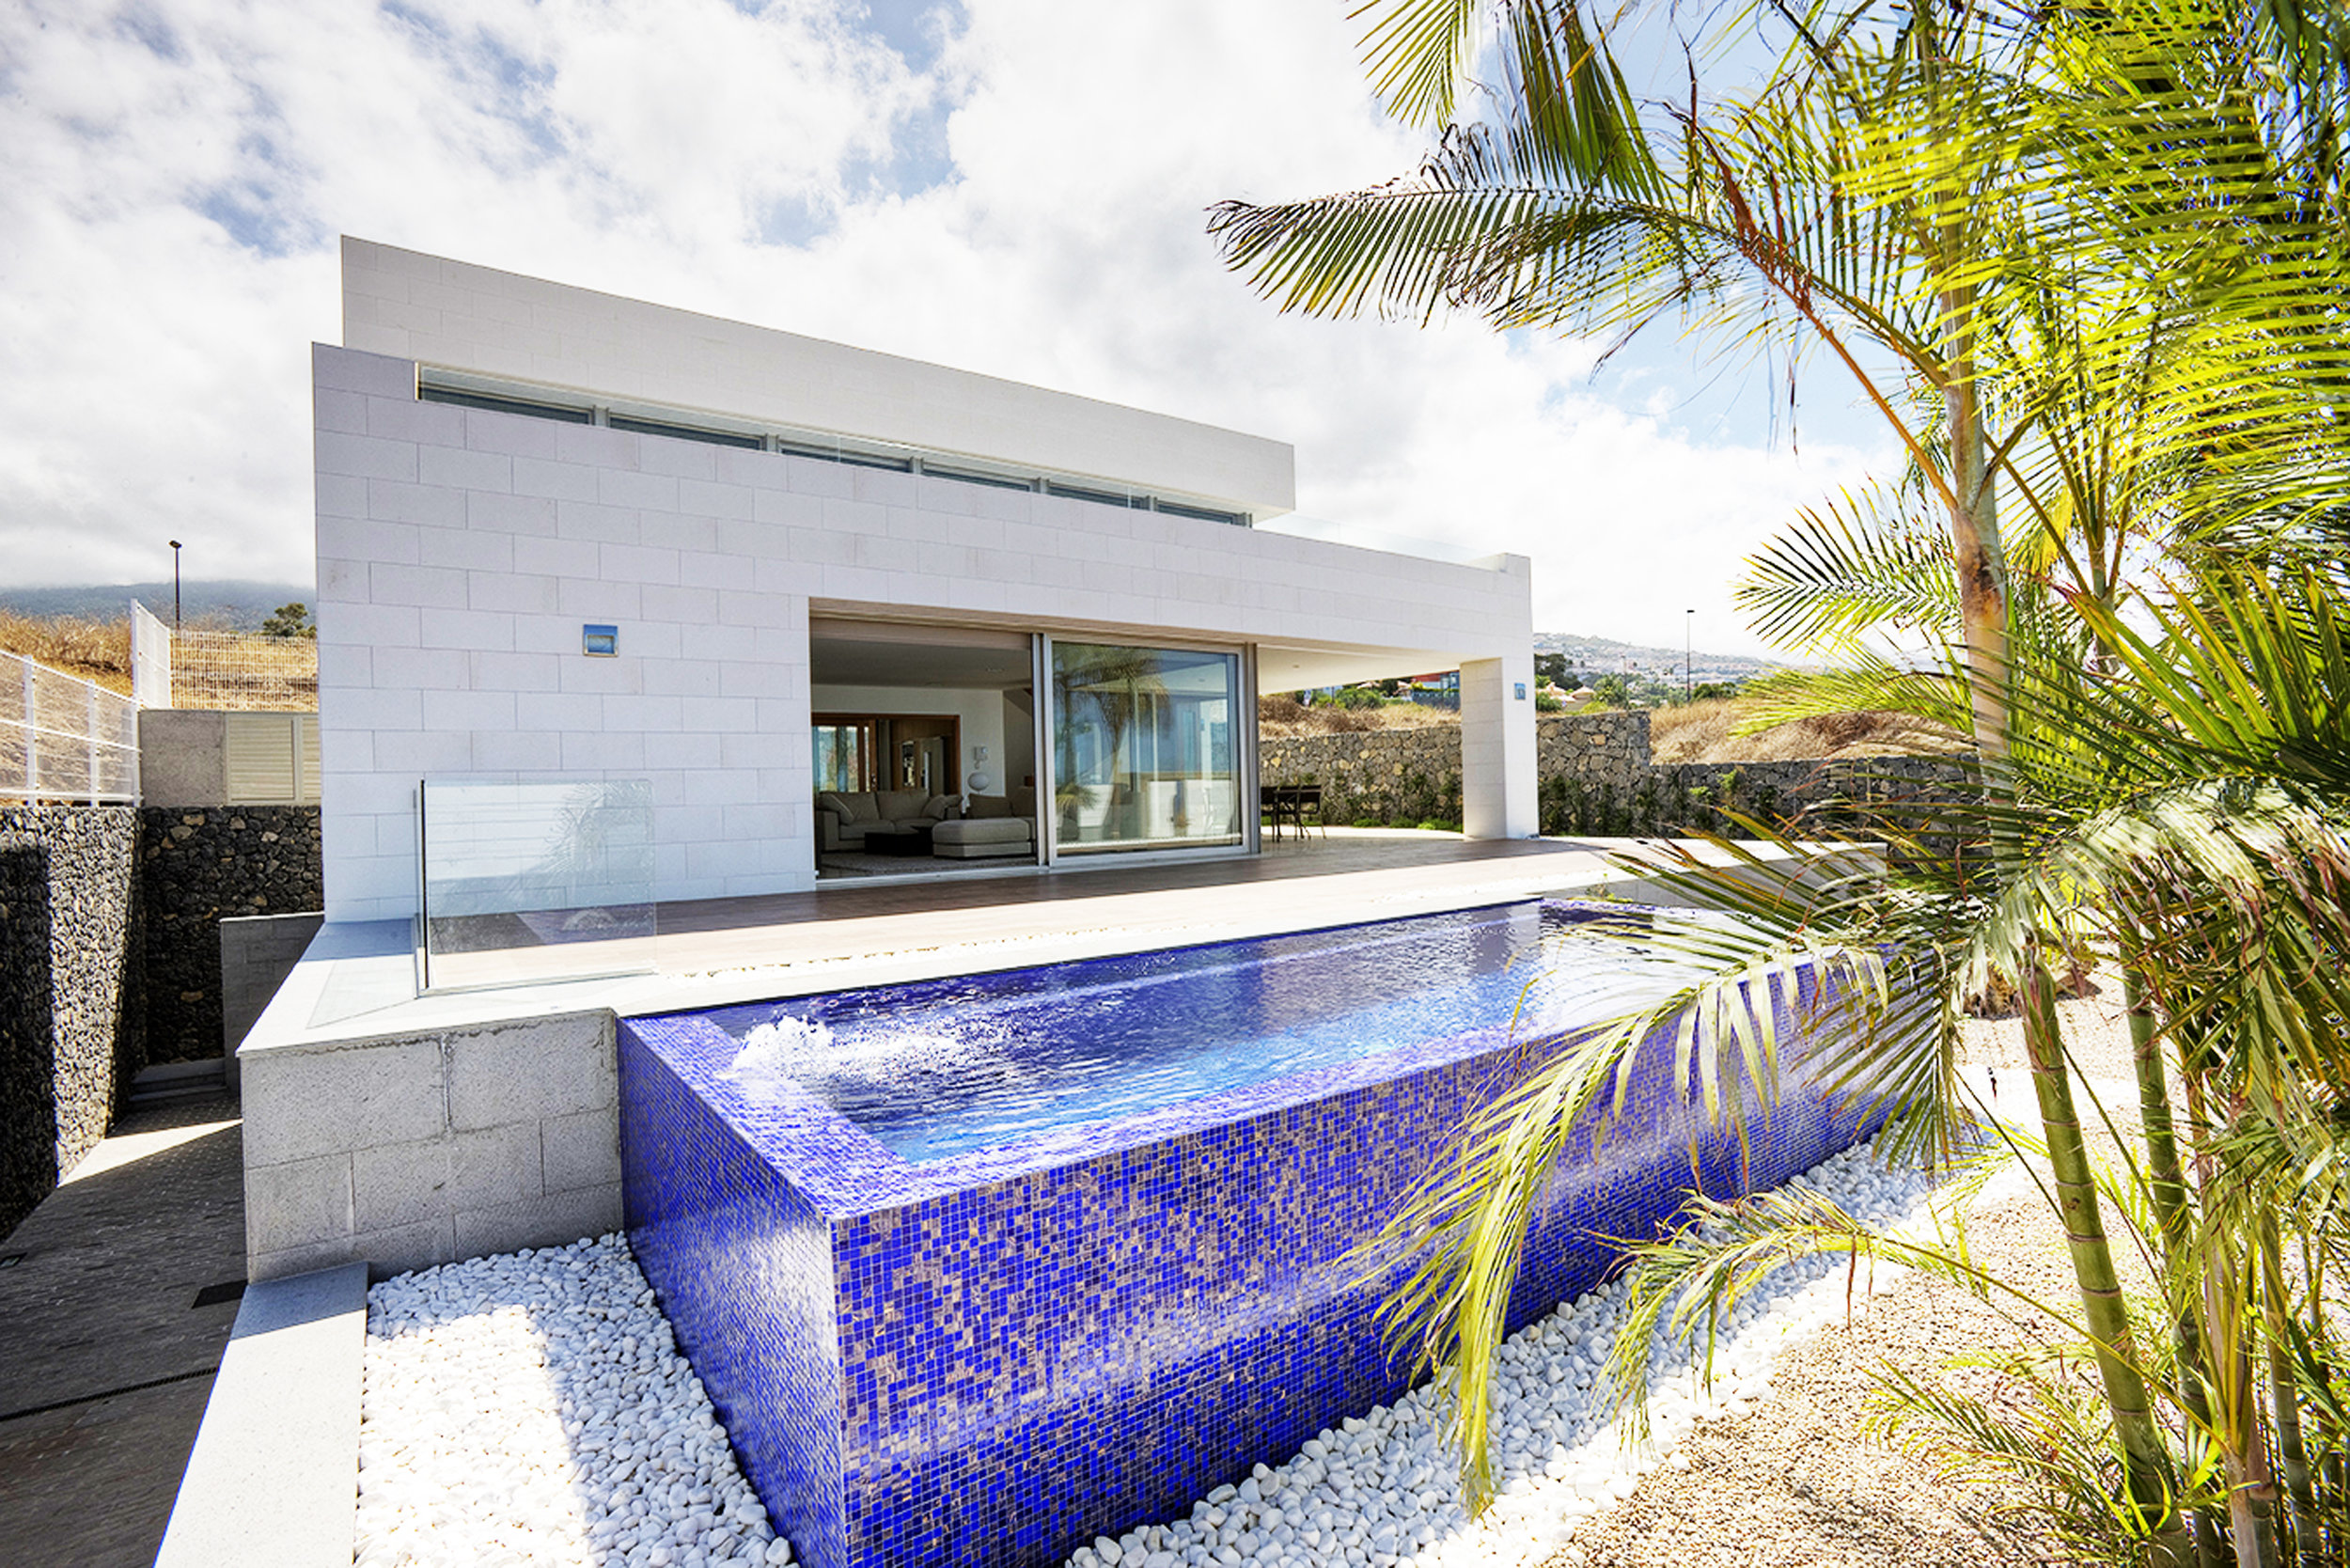 Correa + Estevez Arquitectura - Vivienda en la Quinta 11.JPG